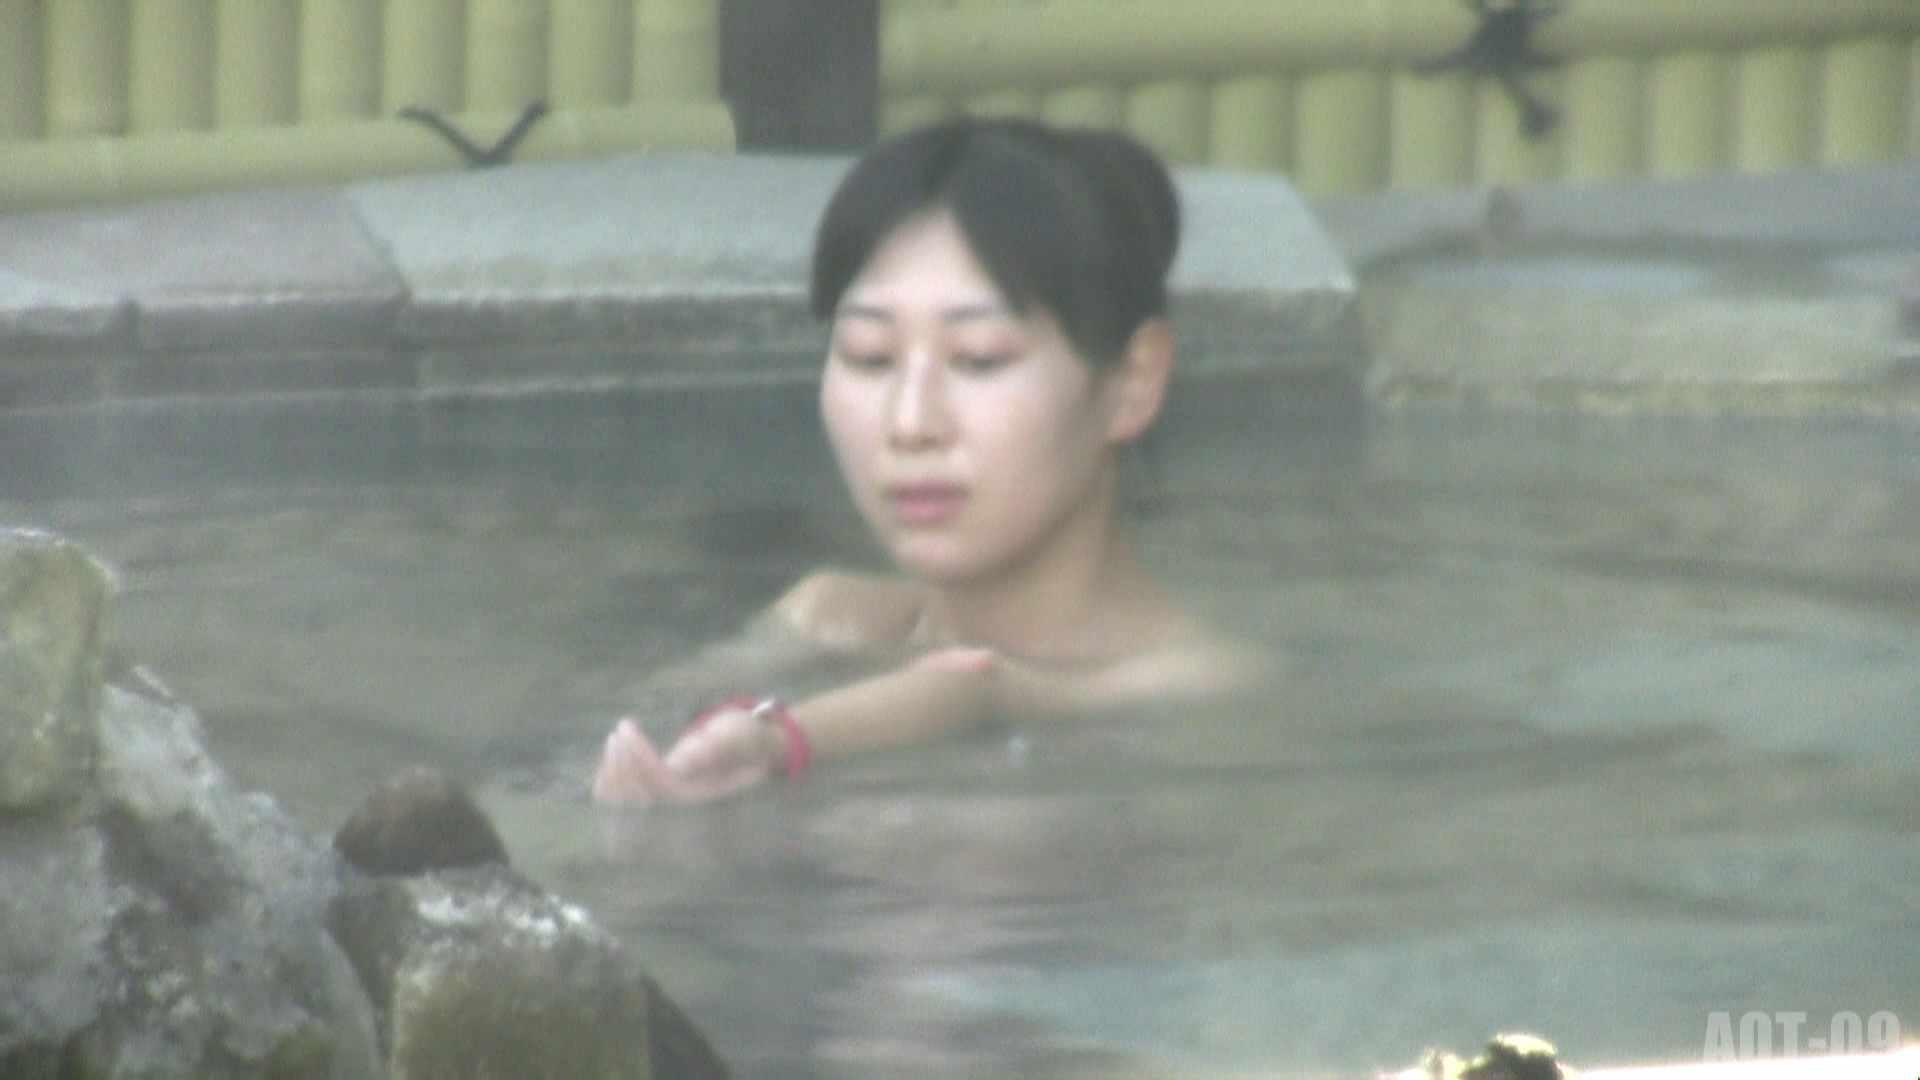 Aquaな露天風呂Vol.785 美しいOLの裸体   露天風呂突入  84pic 25